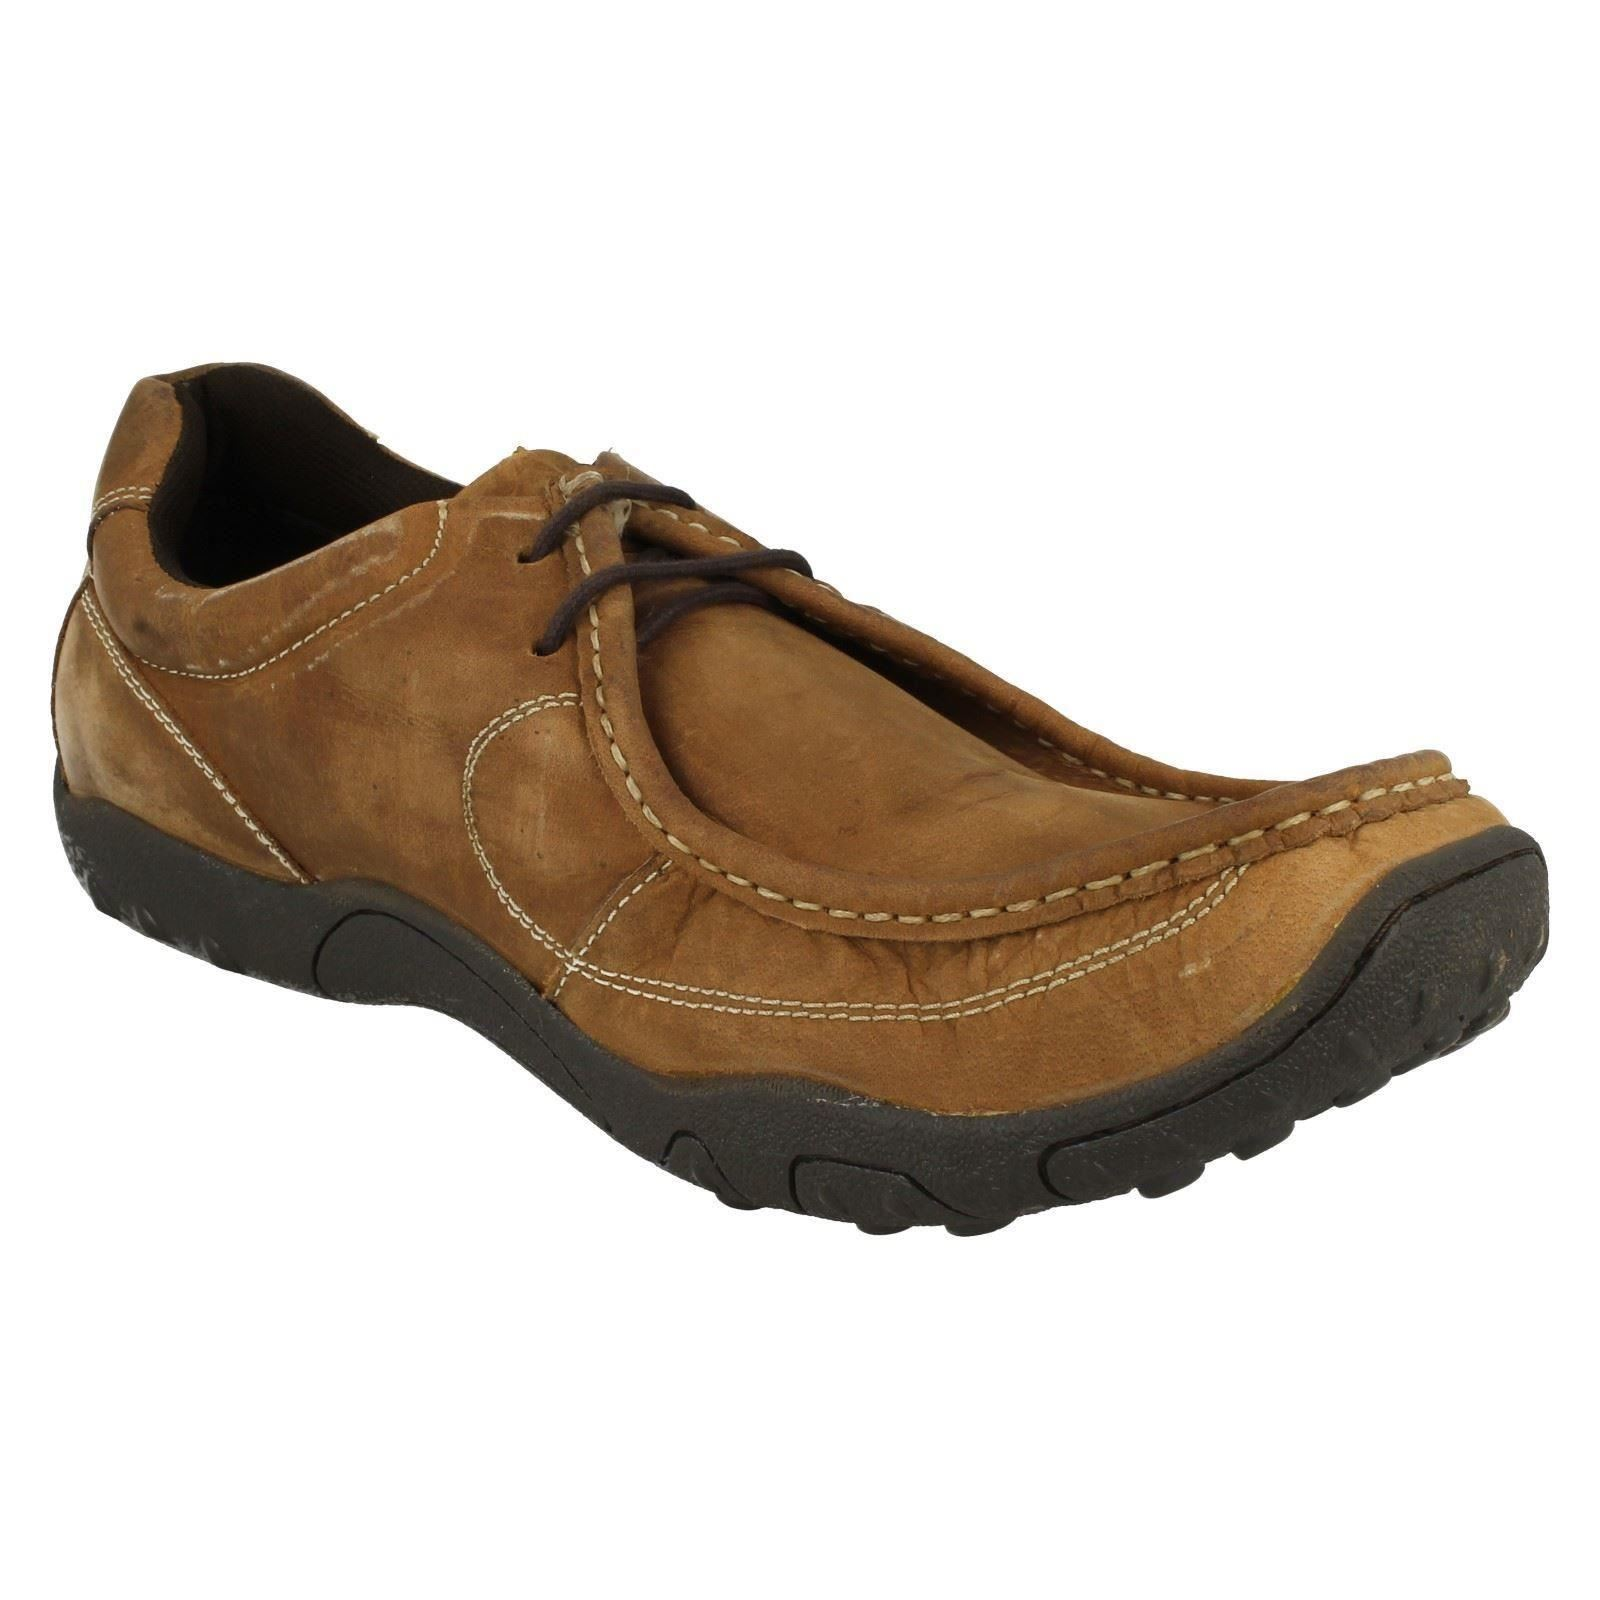 Para Hombre Pod con cordones Informal Zapato * NV 324 *